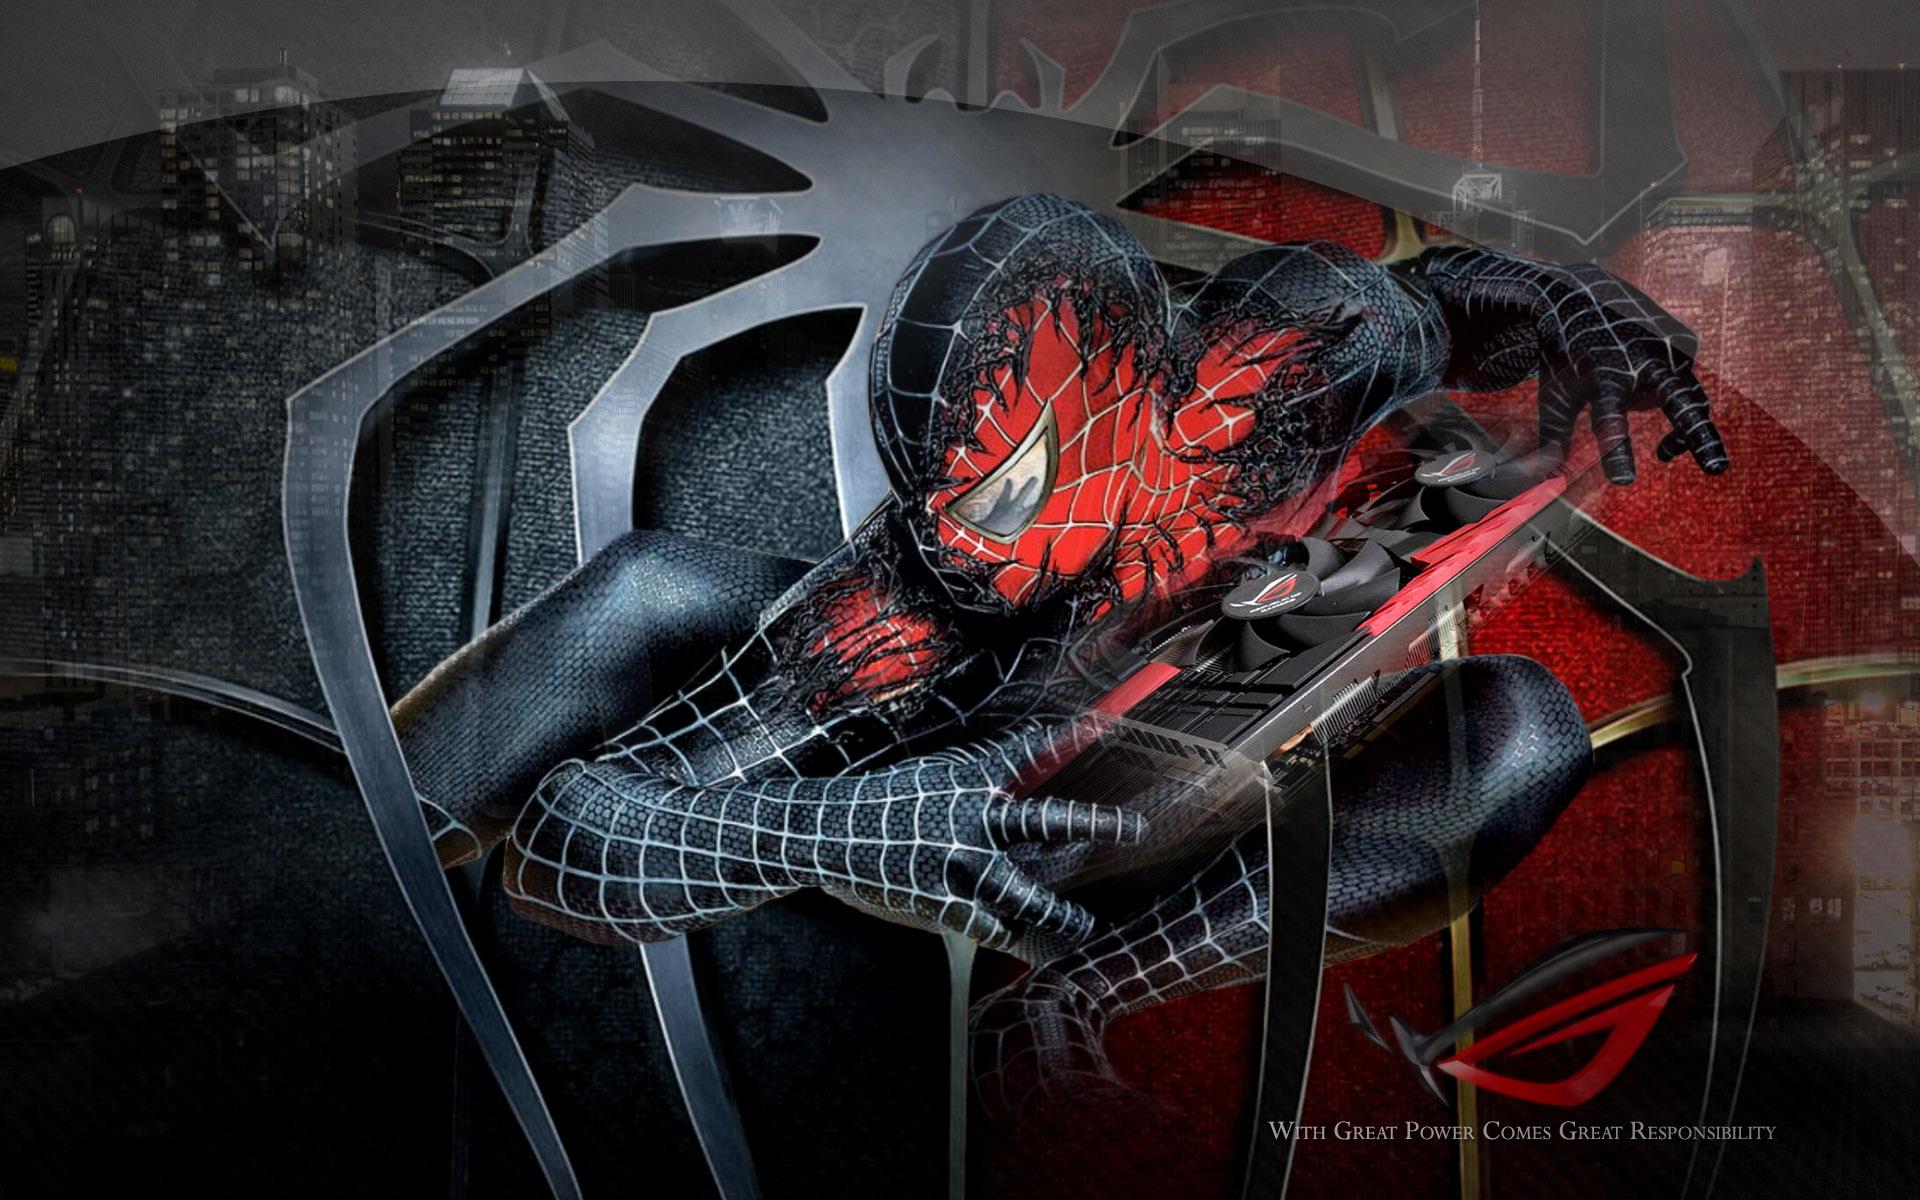 40 Amazing Spiderman Wallpaper HD for PC 1920x1200